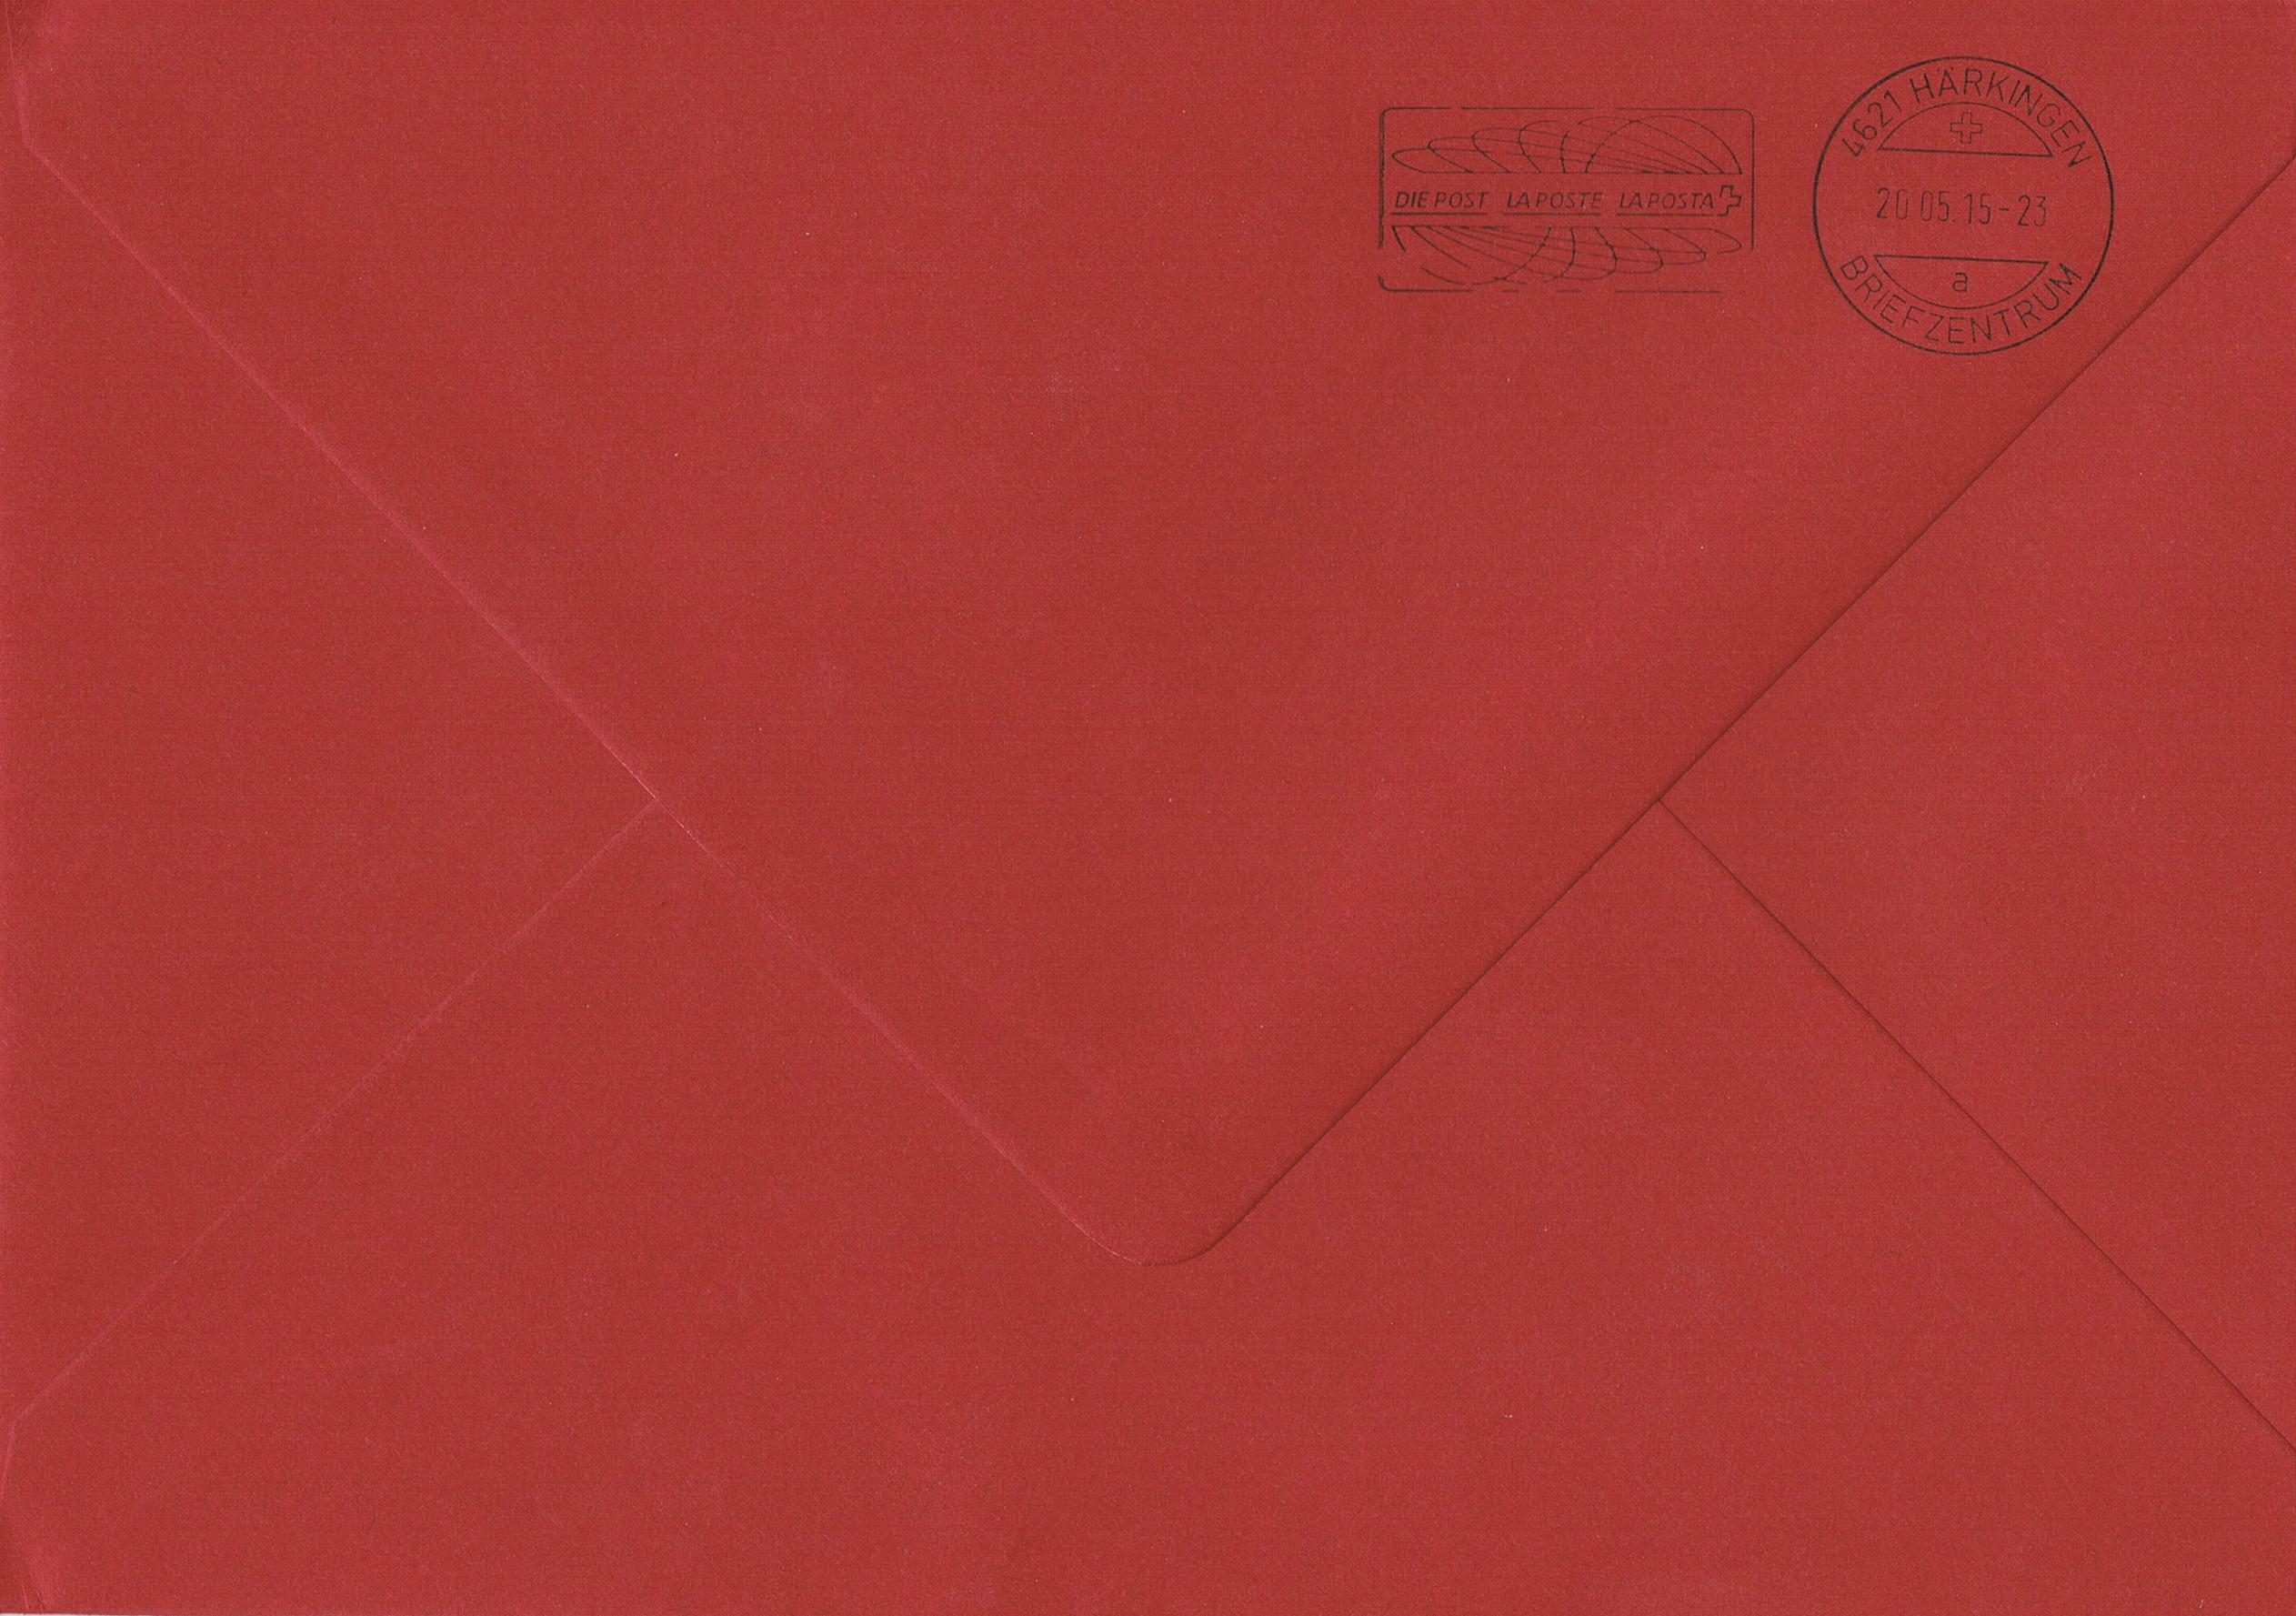 Umschlag Rückseite